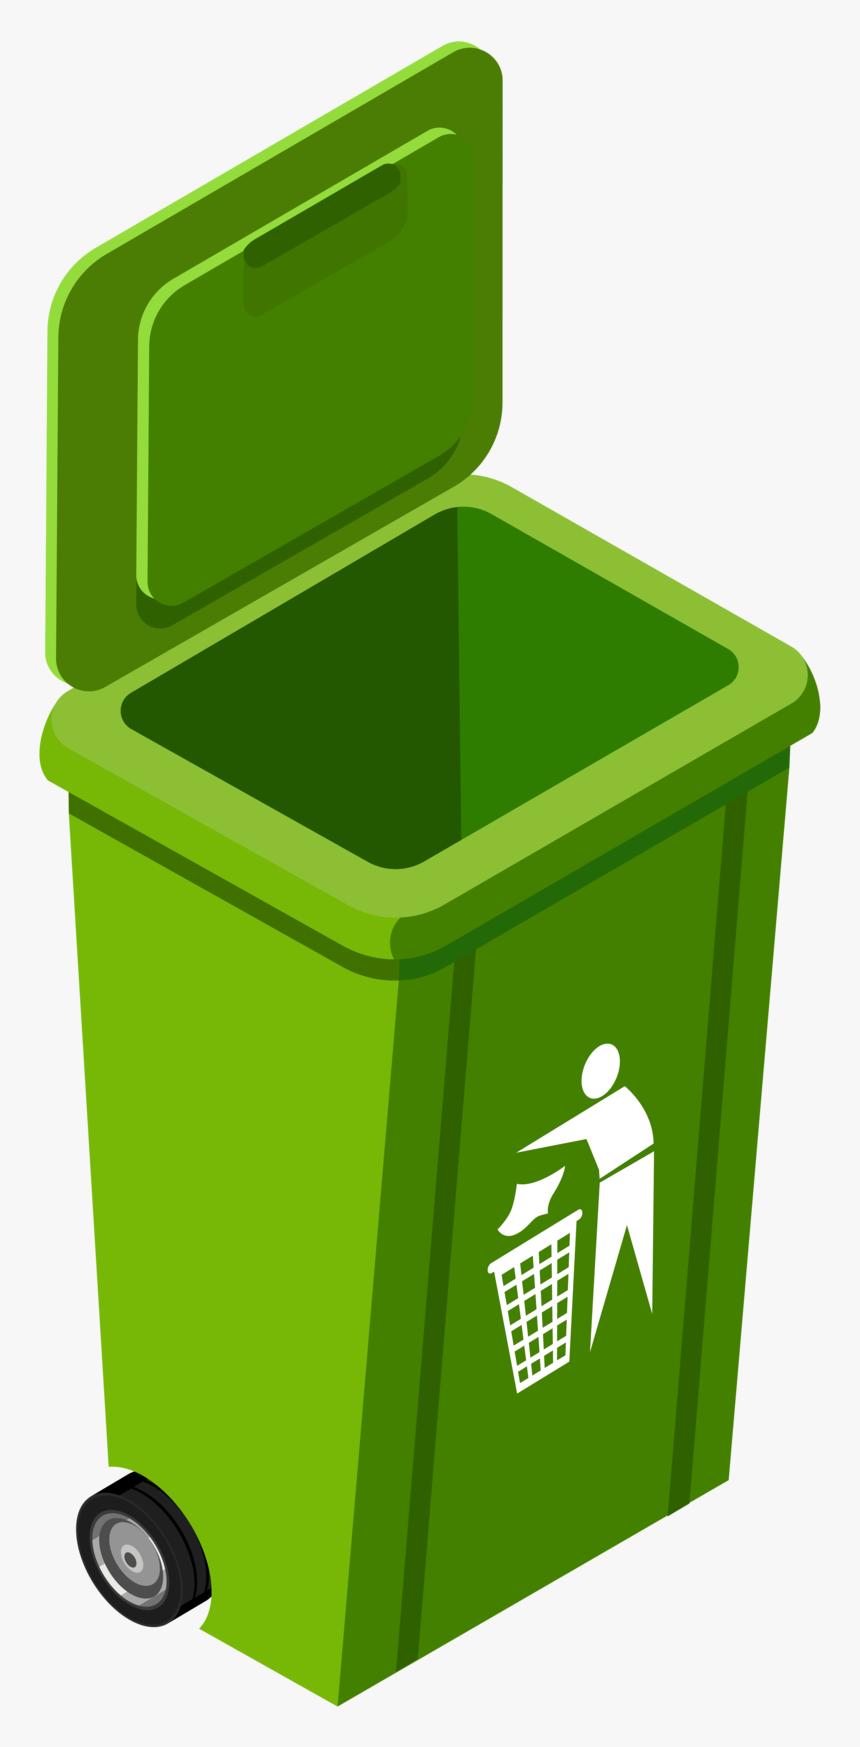 Green Trash Can Image.